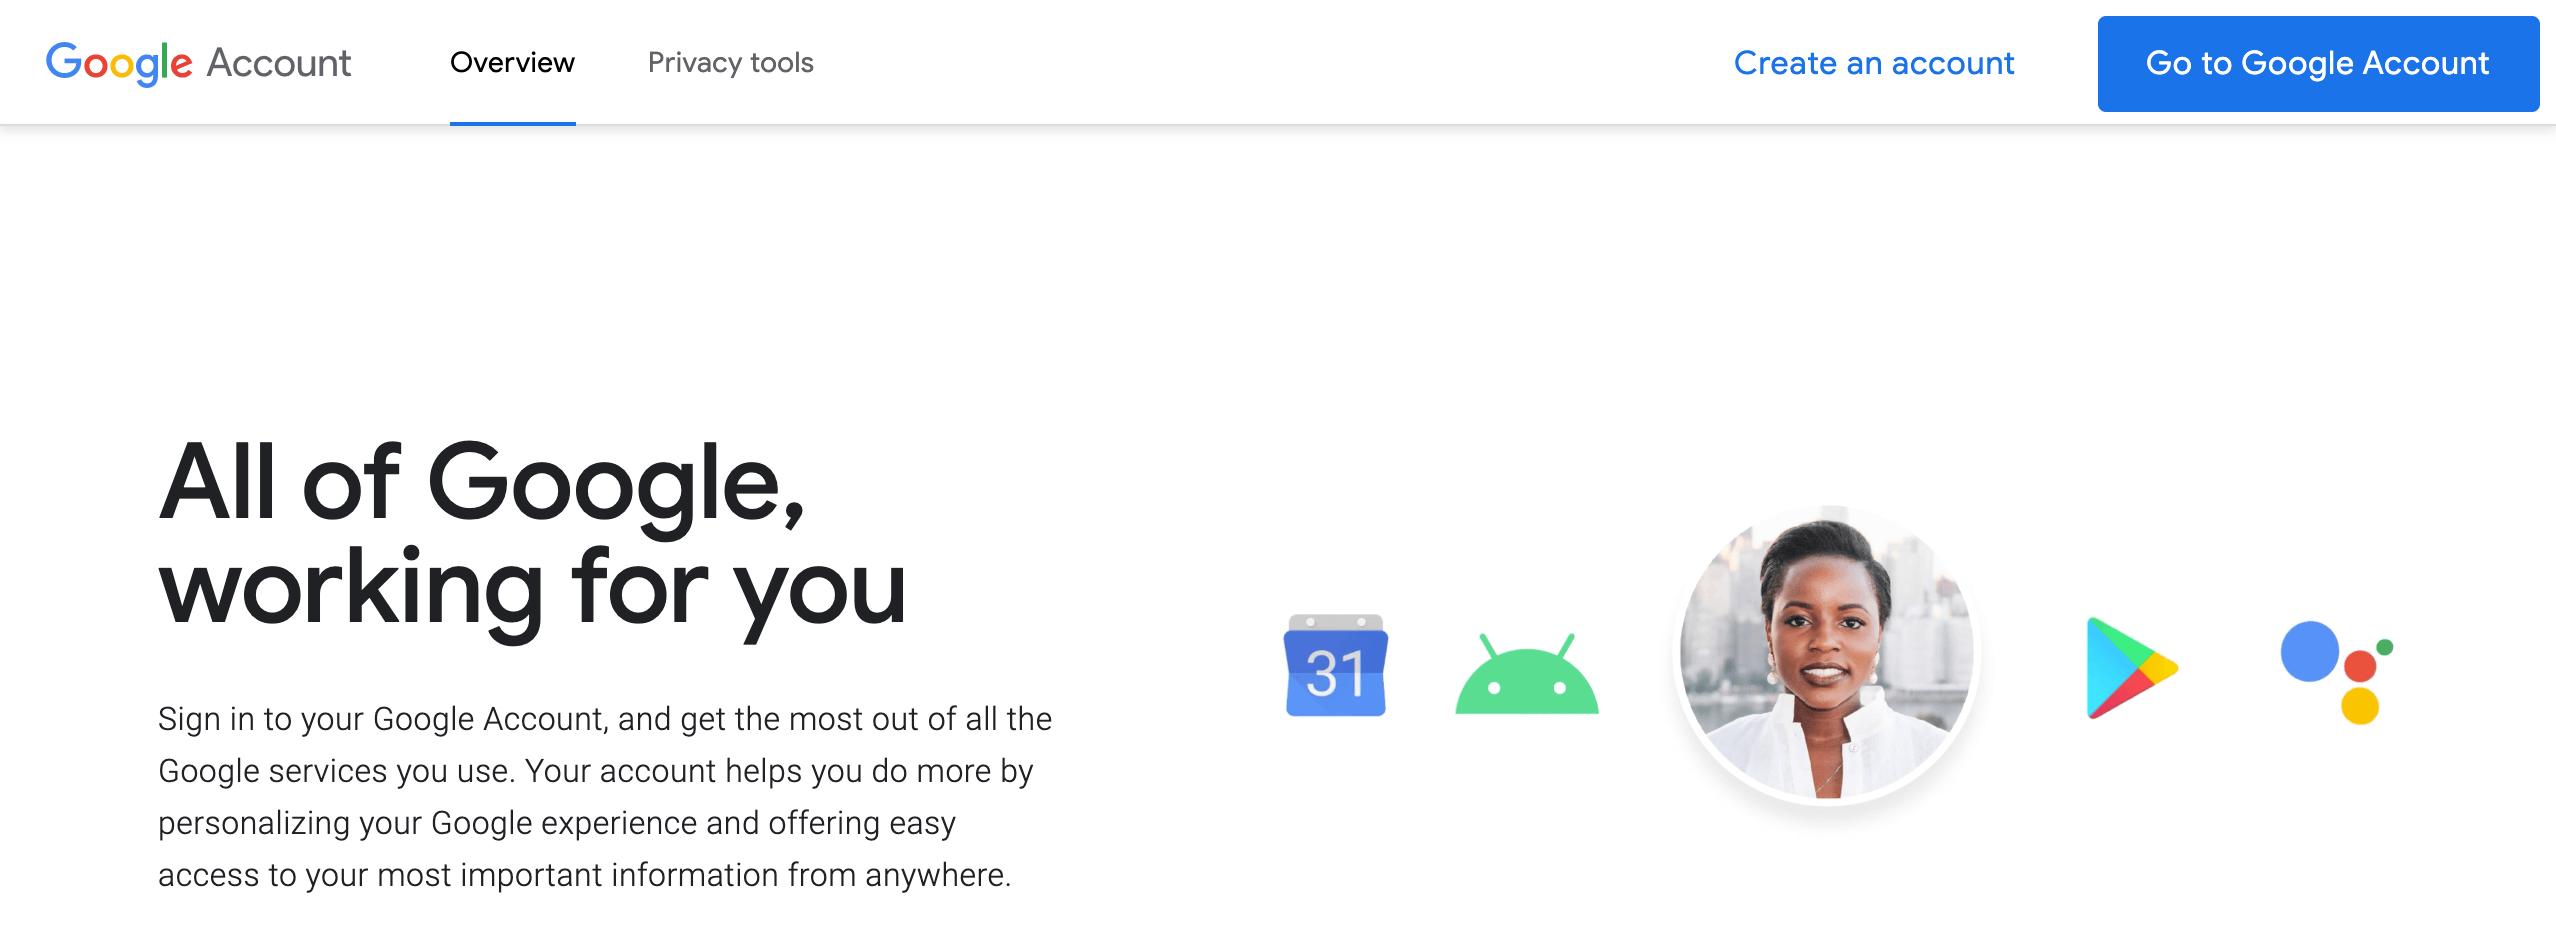 Google Account login screen.